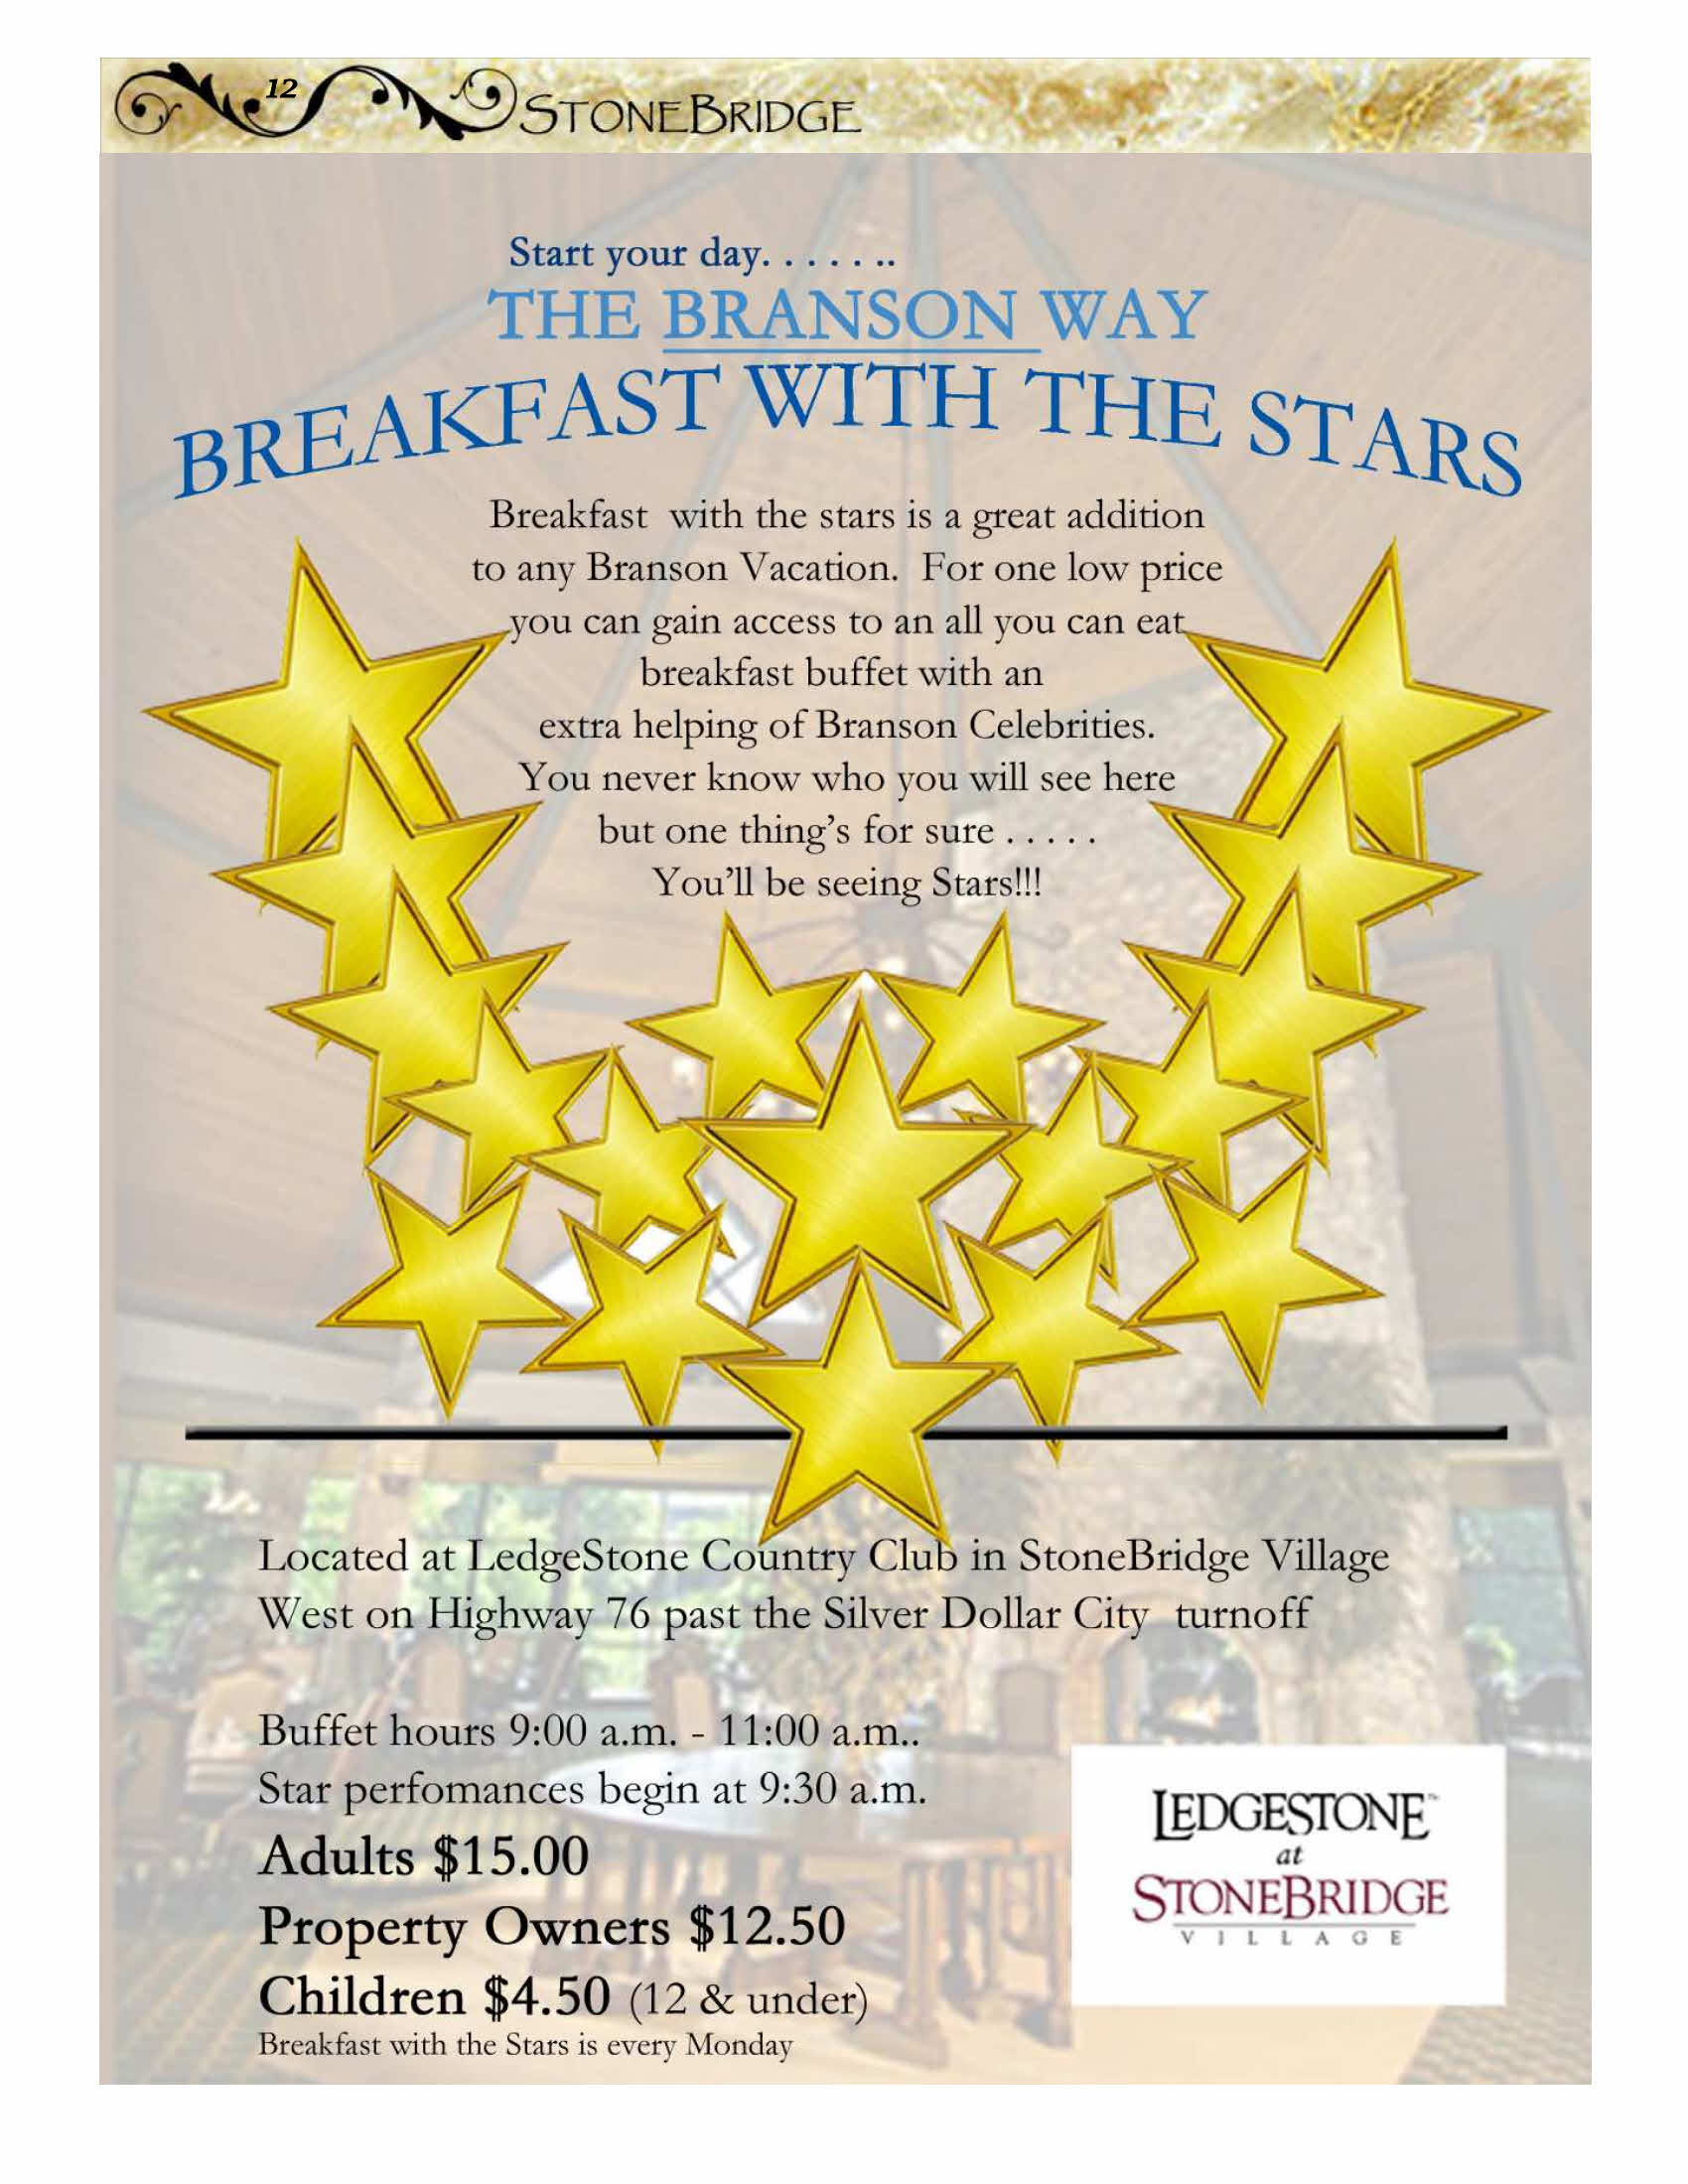 BreakfastWithTheStars10-14